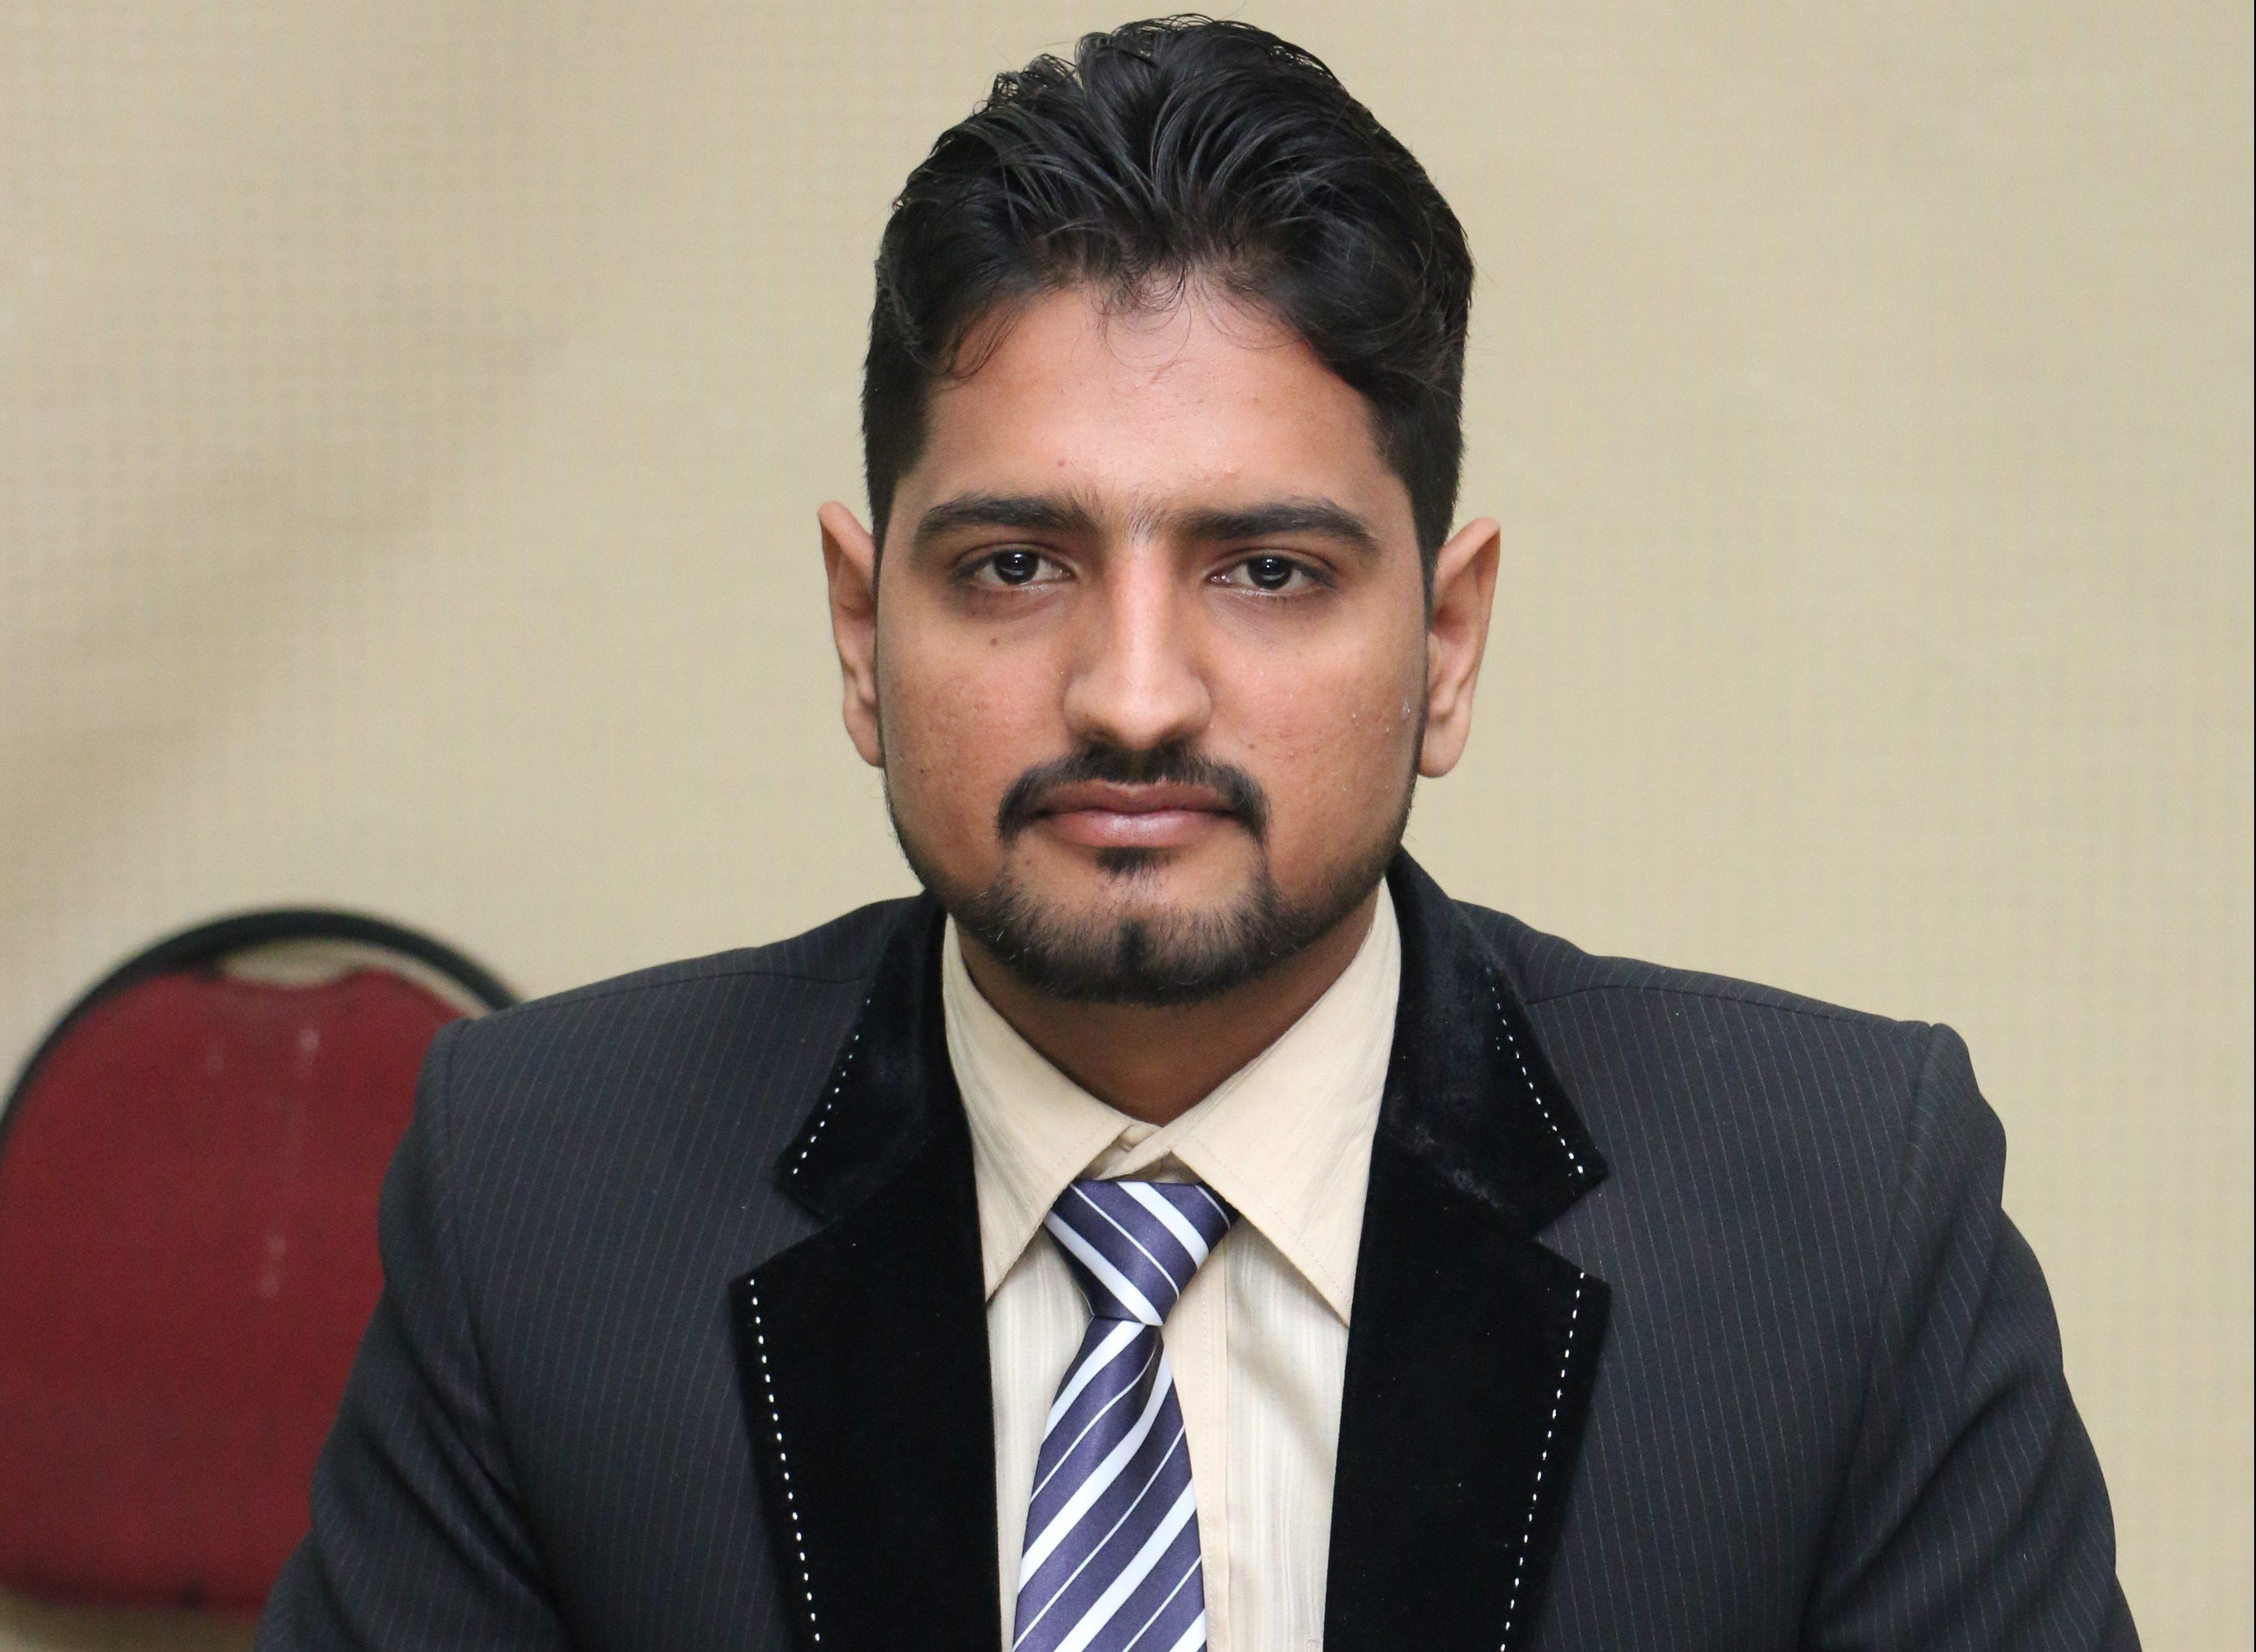 Zahid Mehmood - PestControlOperator